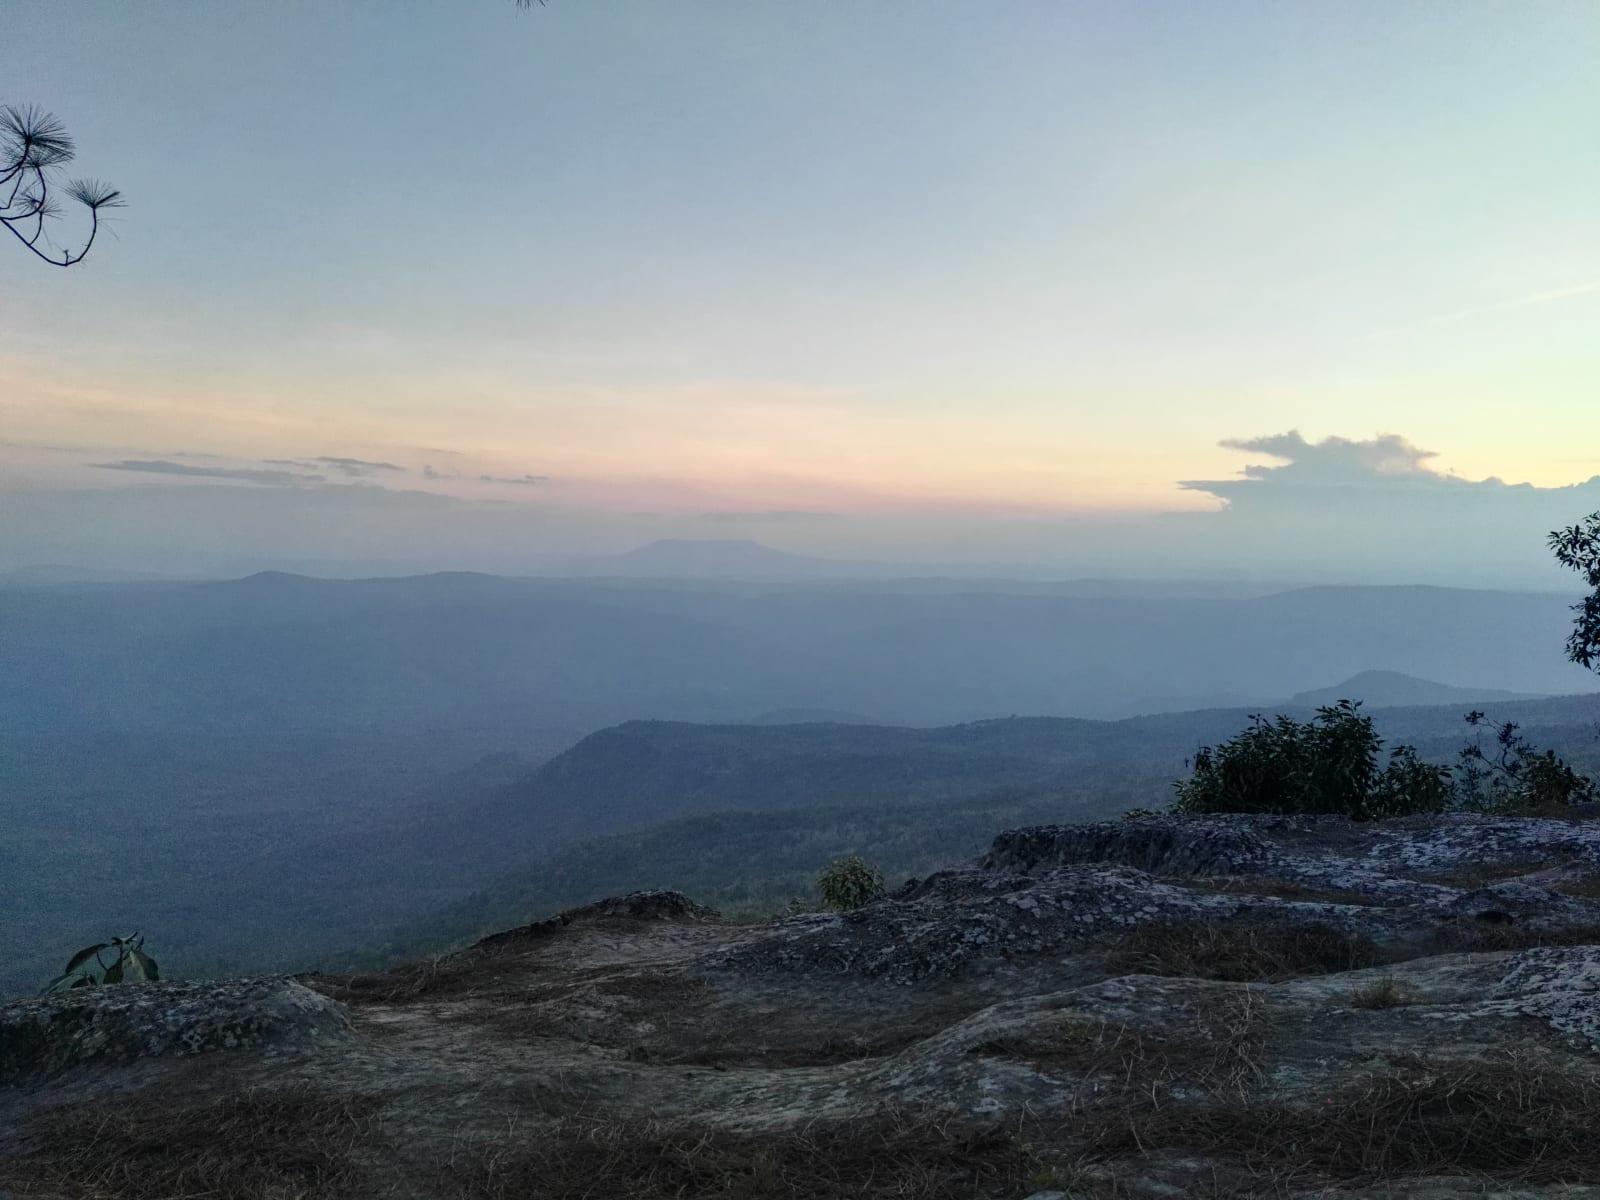 Západ slunce, Phu Kradueng, Loei, Thajsko